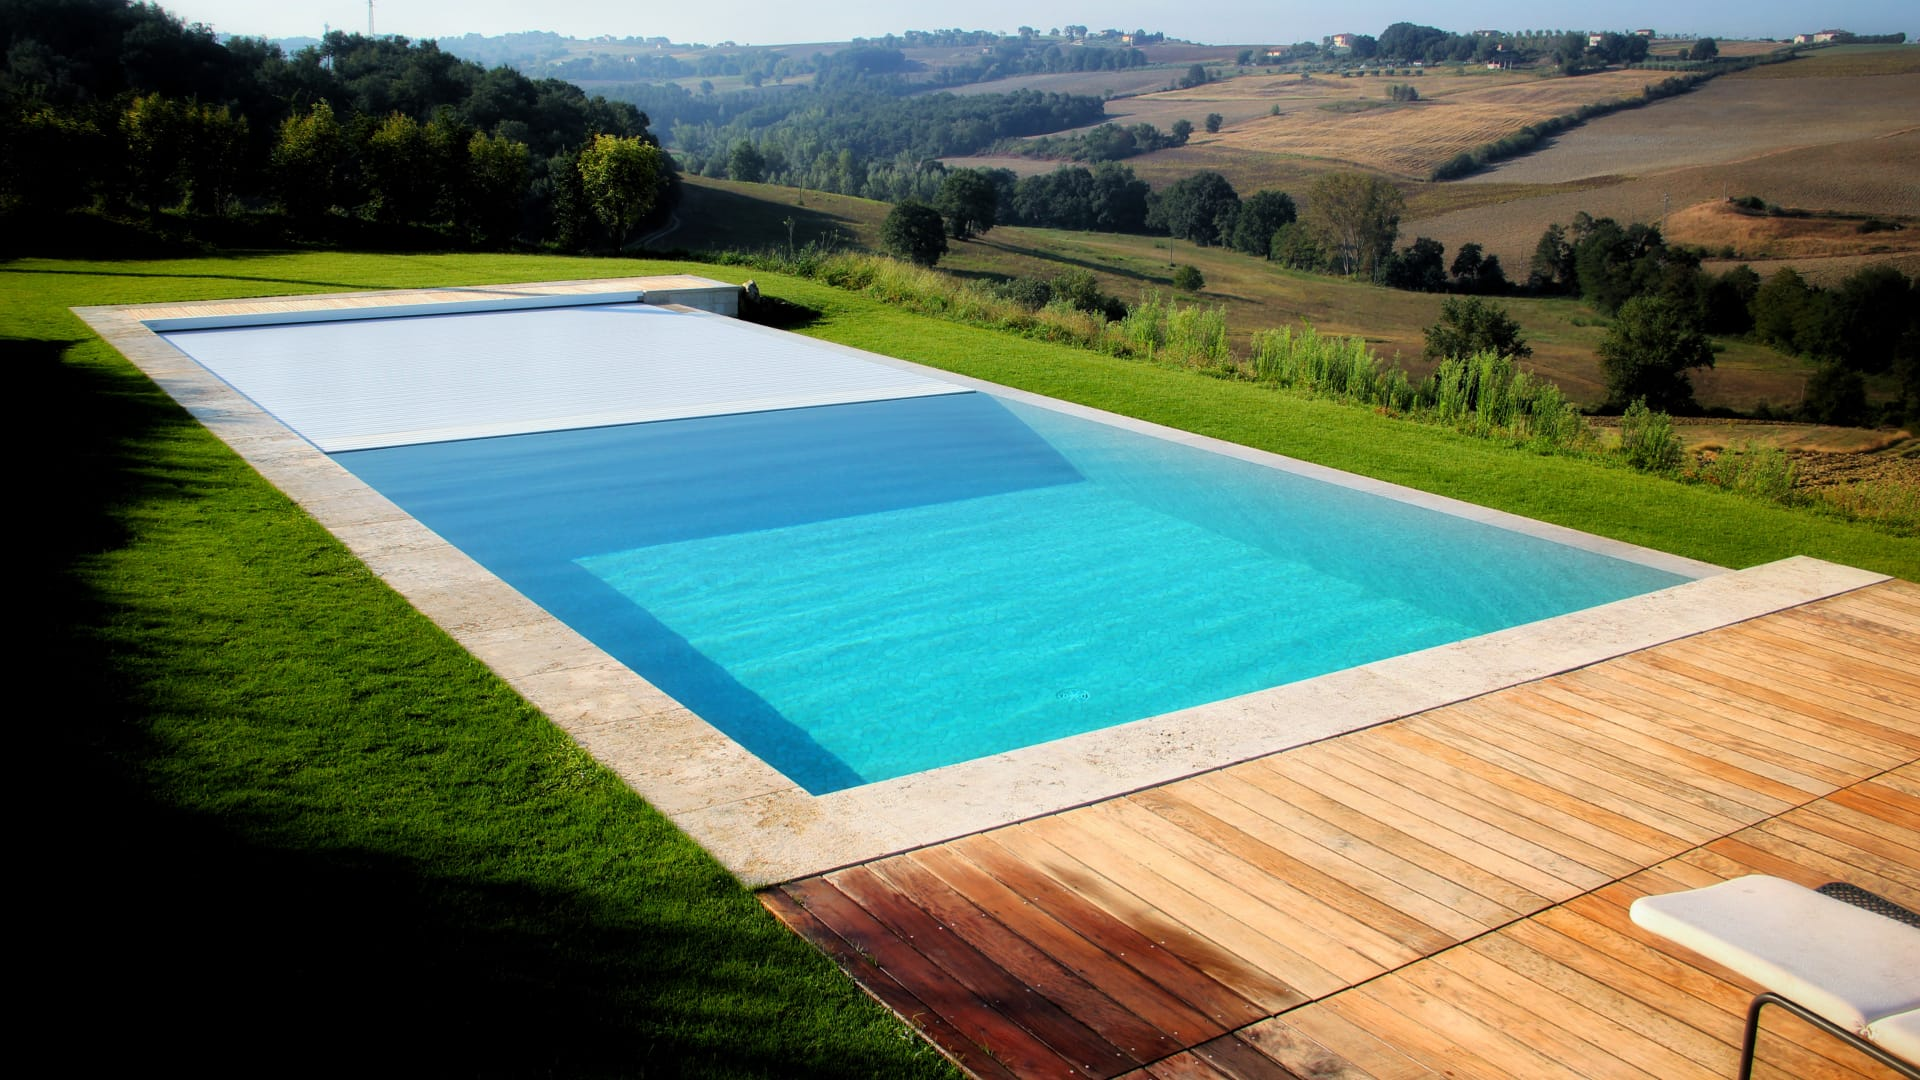 Tensostrutture e coperture piscina e padel Padova   Favaretti Group